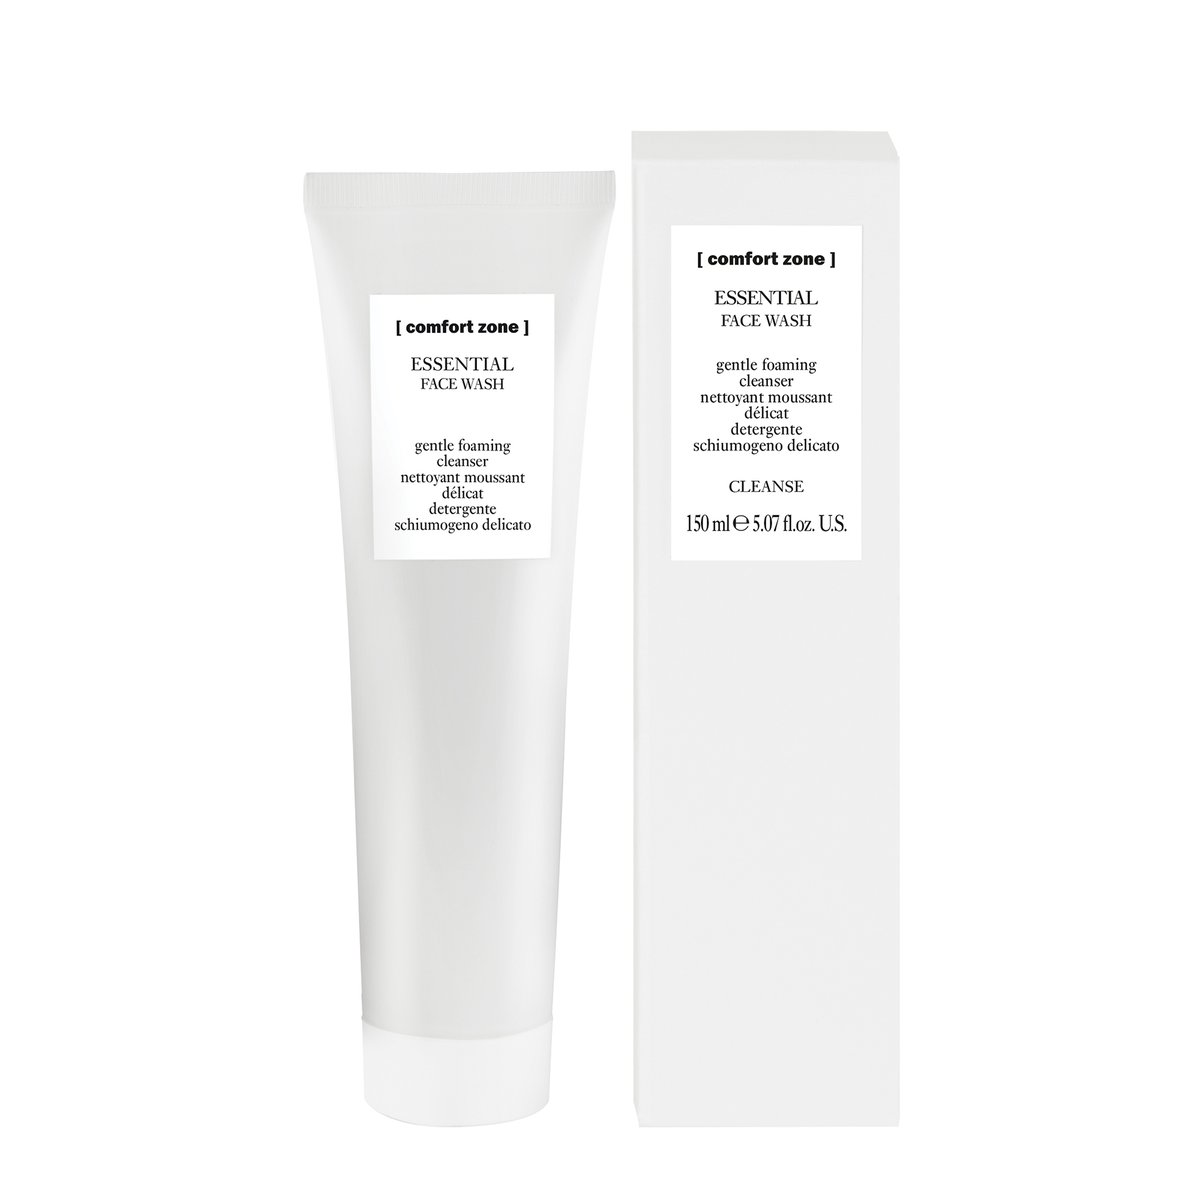 Kem Rửa Mặt Tạo bọt dịu nhẹ Comfort Zone Essential Face Wash 150ml (HSD: 10/23)